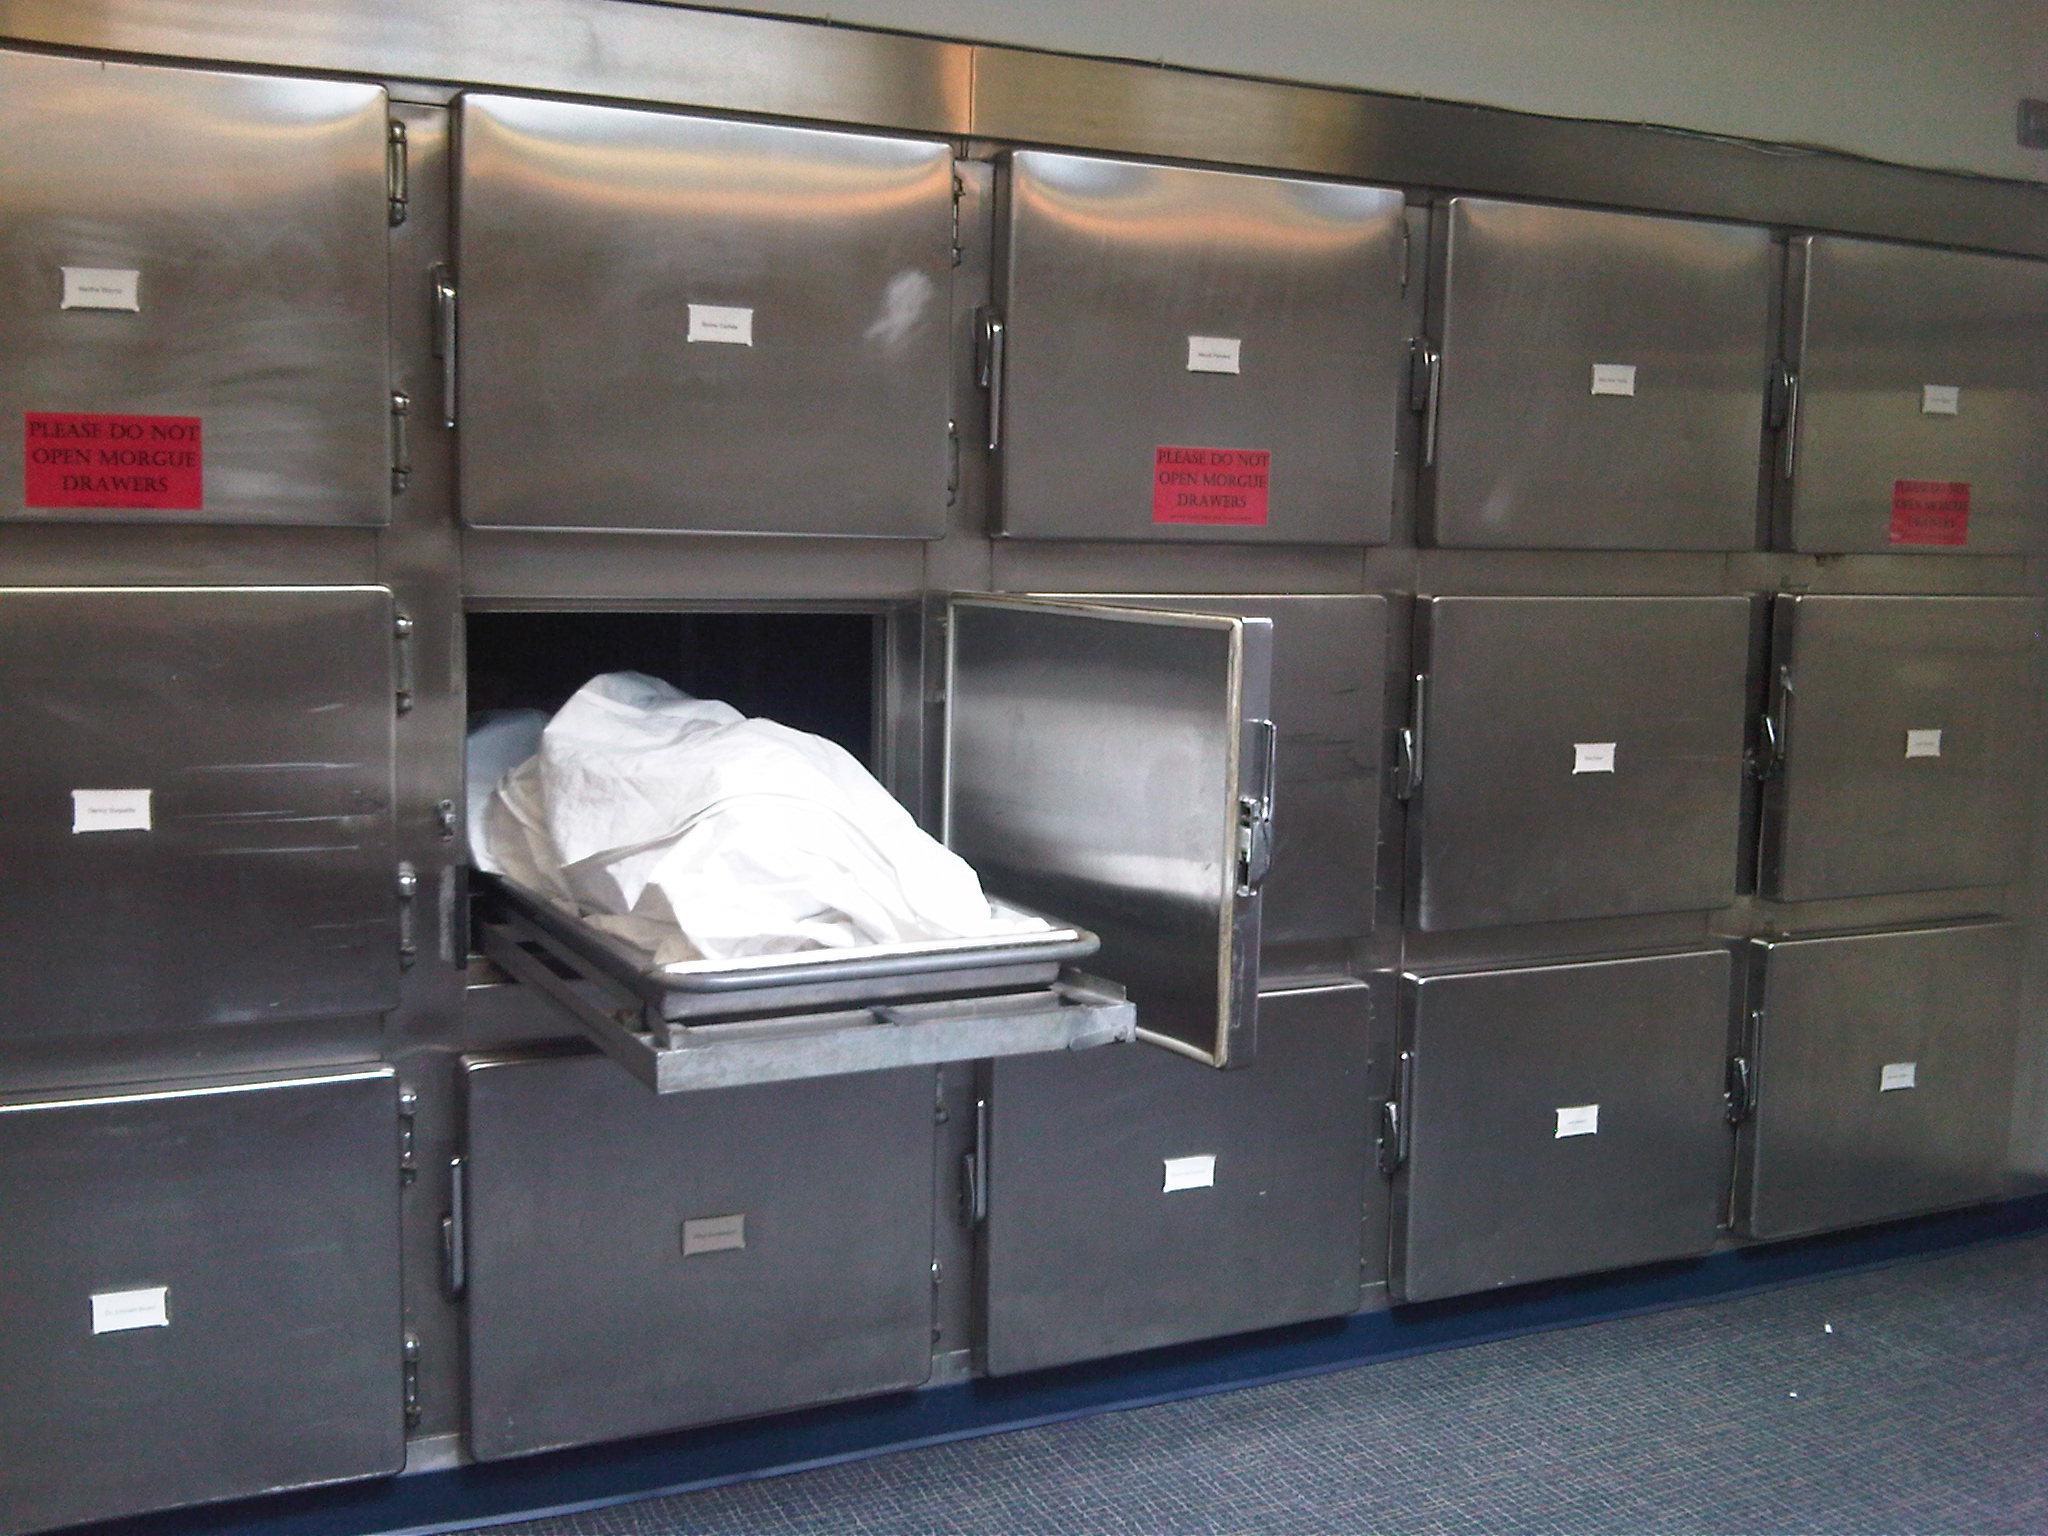 Venezuela's Government-Run Healthcare Morgue